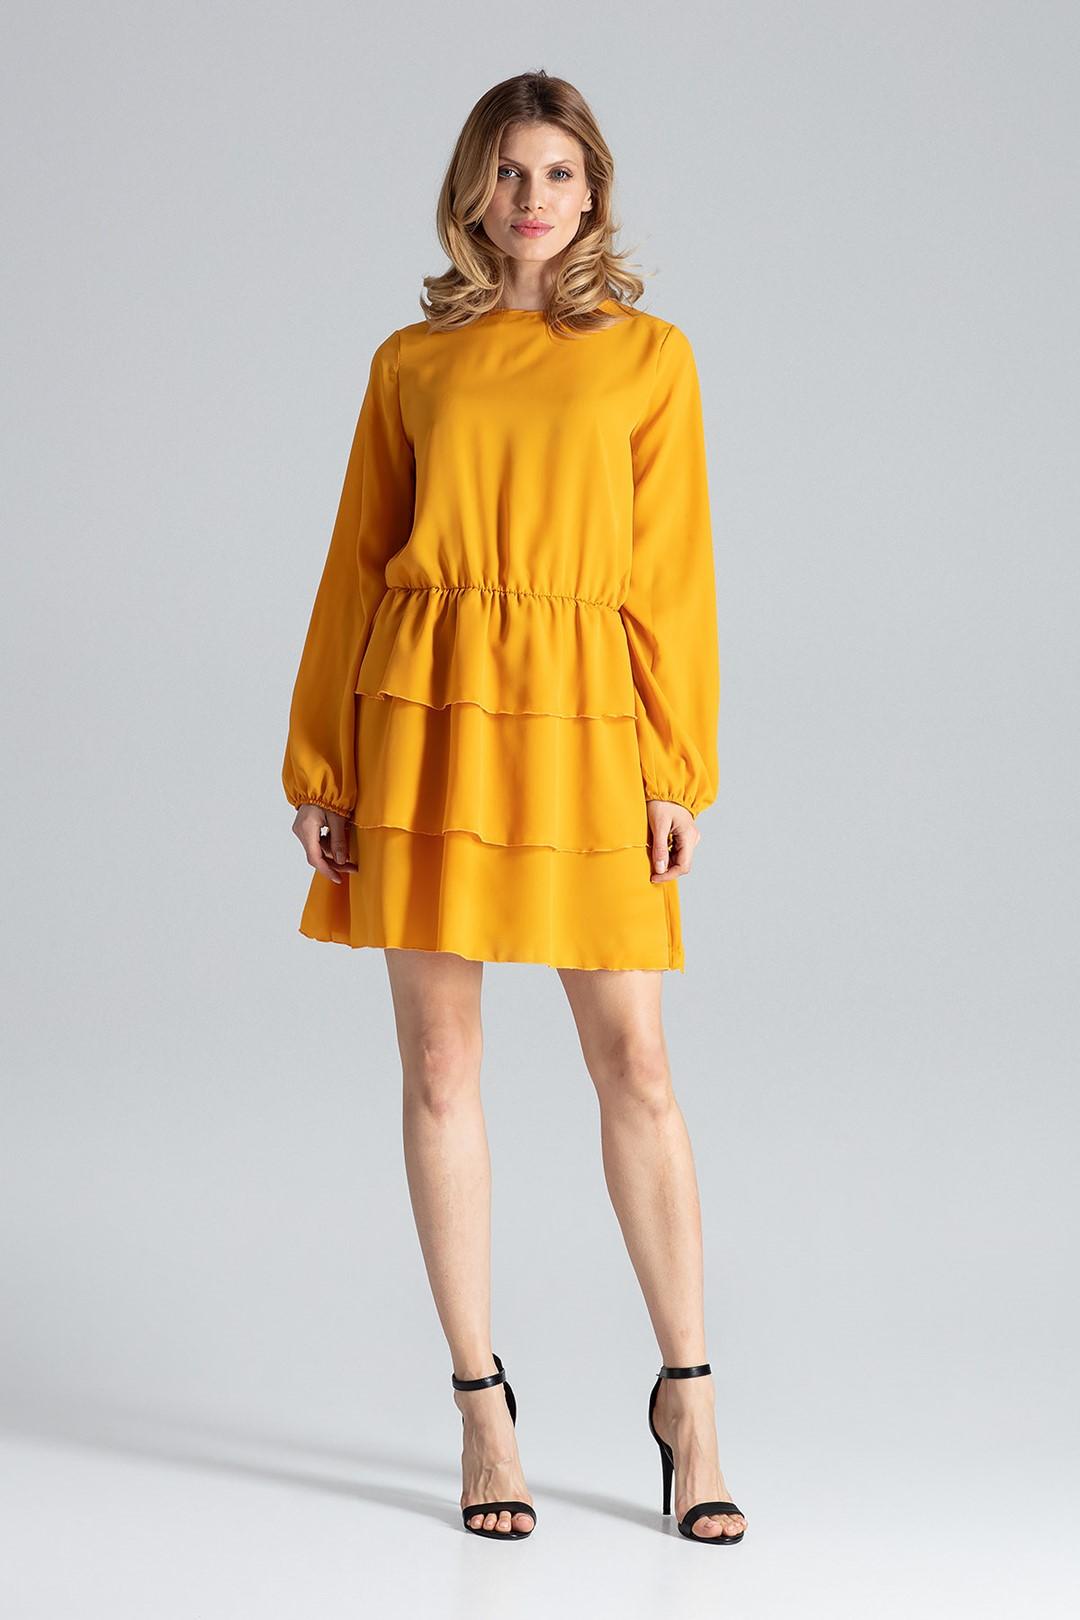 FIGL Hořčicové skládané šaty M601 velikost: S, odstíny barev: žlutá